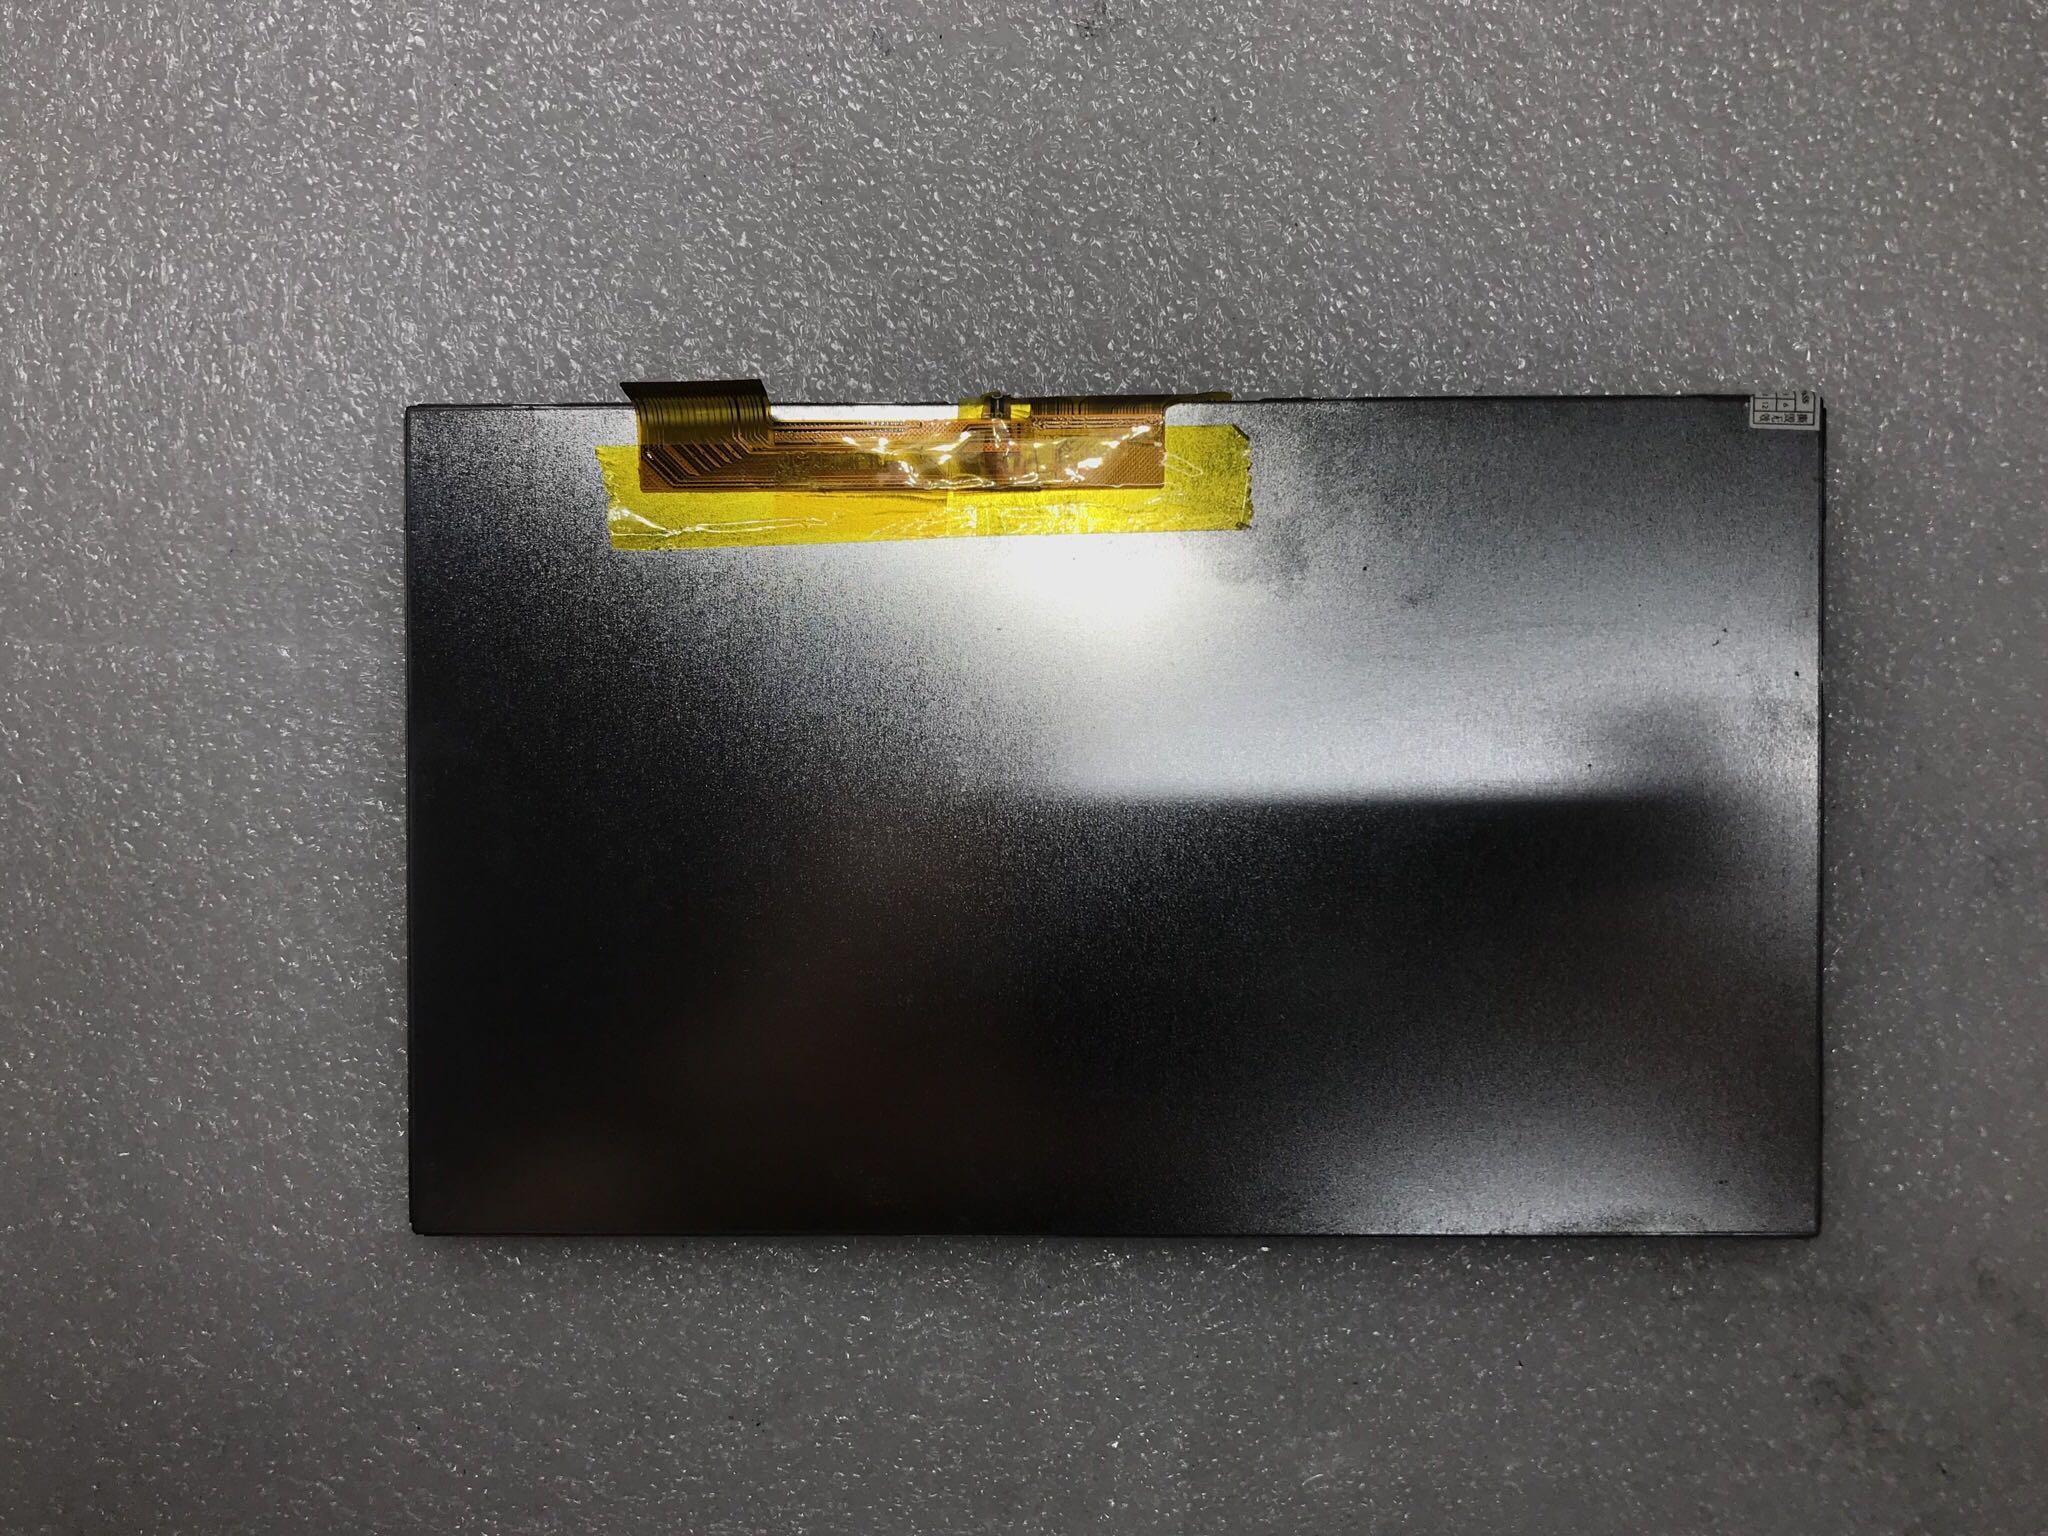 QC7DMIPIU شاشات الكريستال السائل يعرض الشاشة